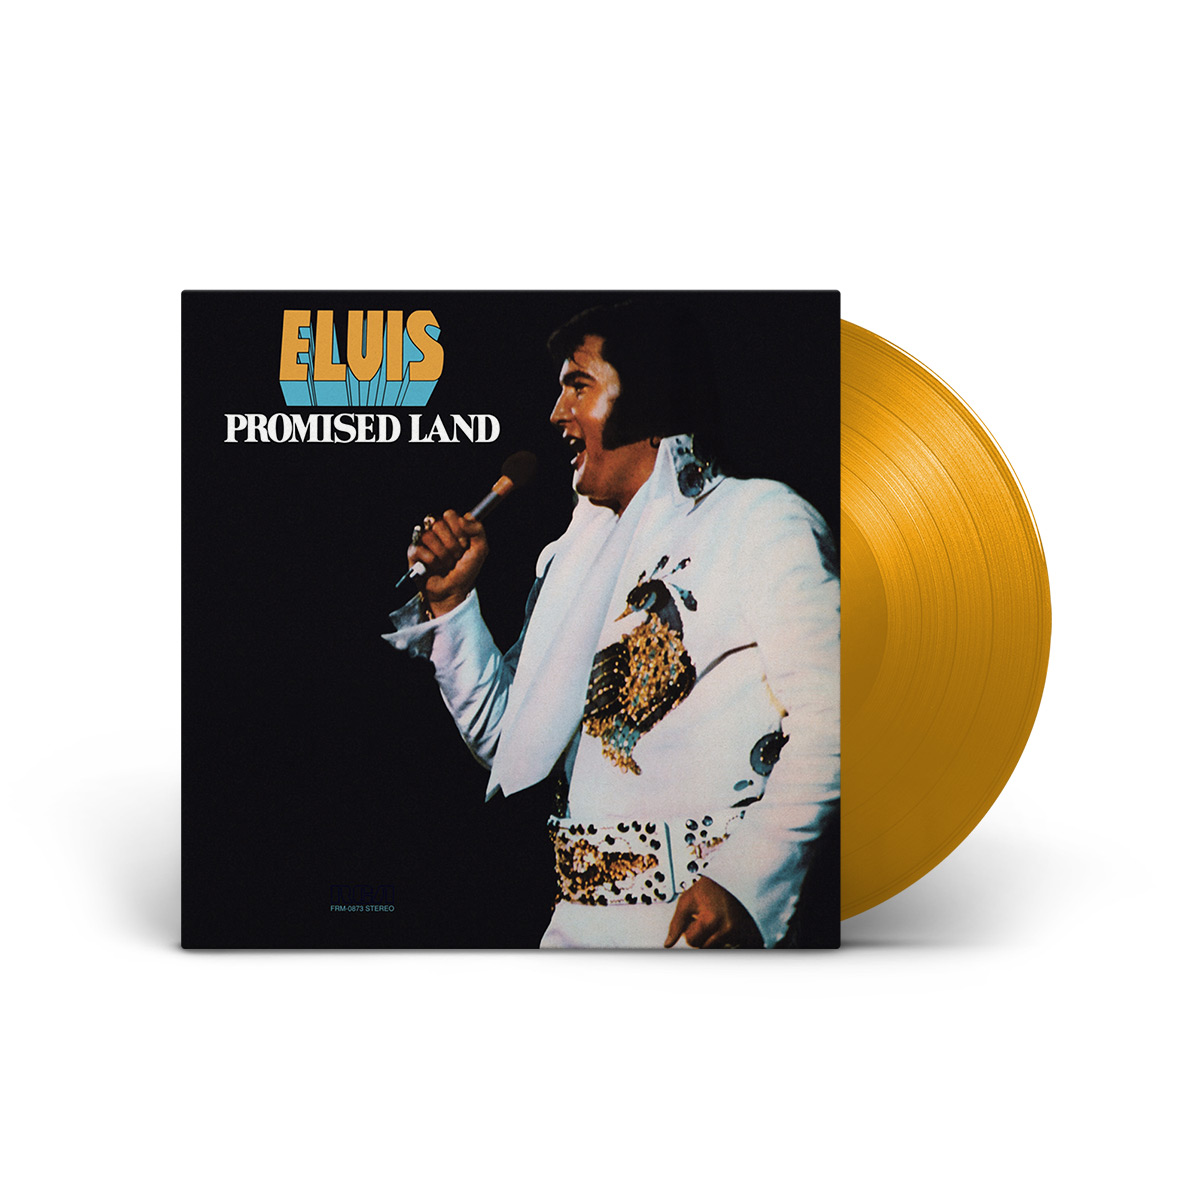 Limited Edition Promised Land 180 Gram Audiophile Translucent Gold Vinyl